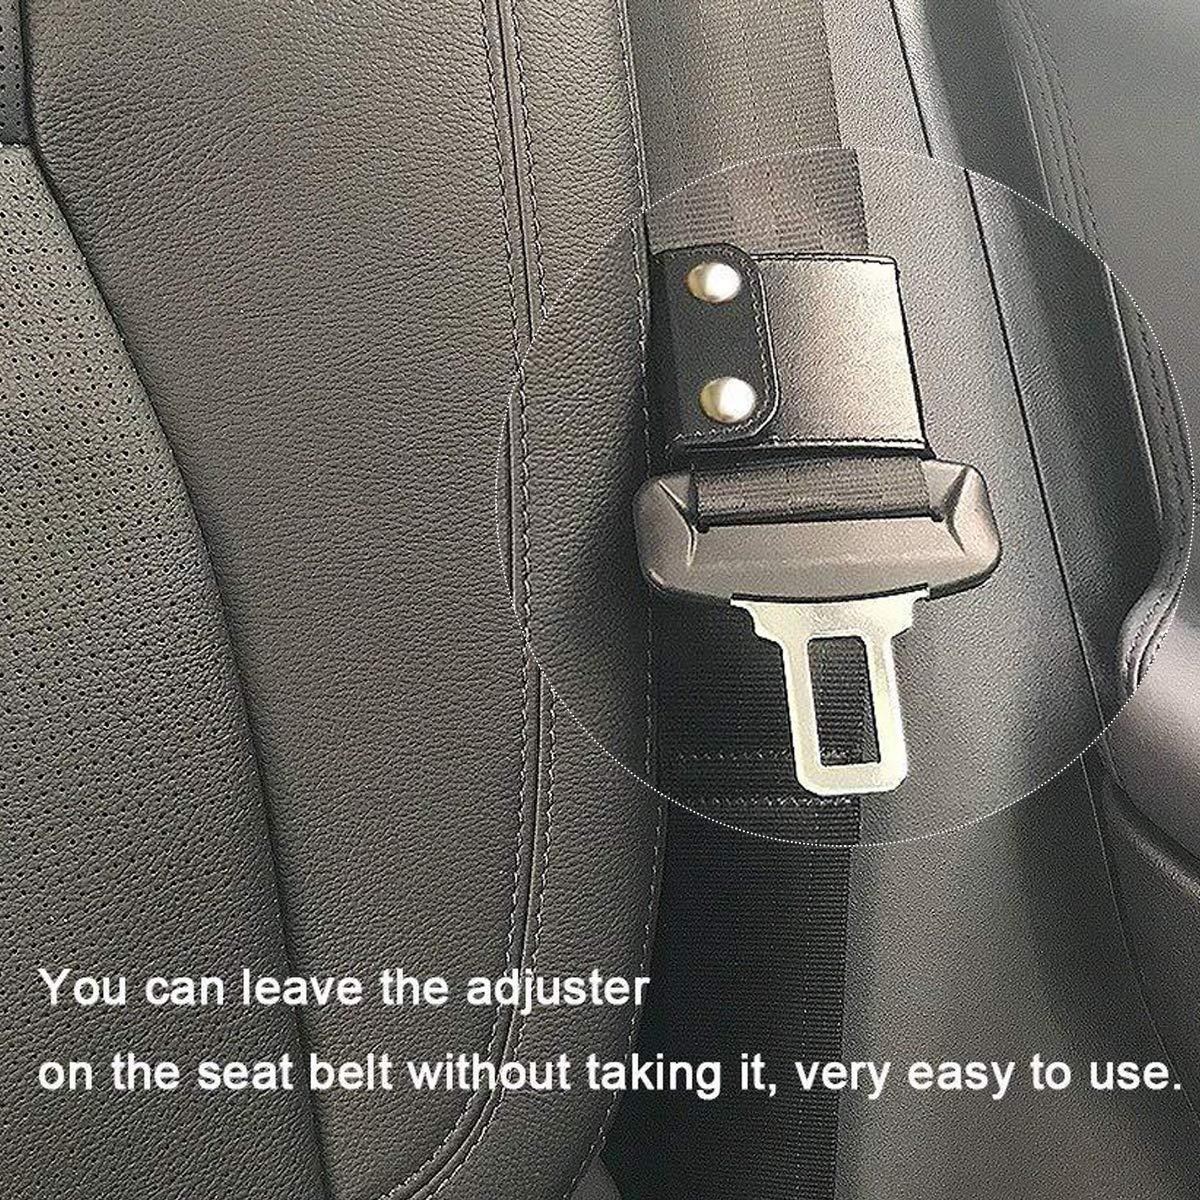 Vehicle Car Seat Belt Safety Positioner Protector Locking Clip Leather Cover Black Comfort Universal Auto Shoulder Neck Strap Positioner Hubs Gadget 4 Pieces Seatbelt Adjuster